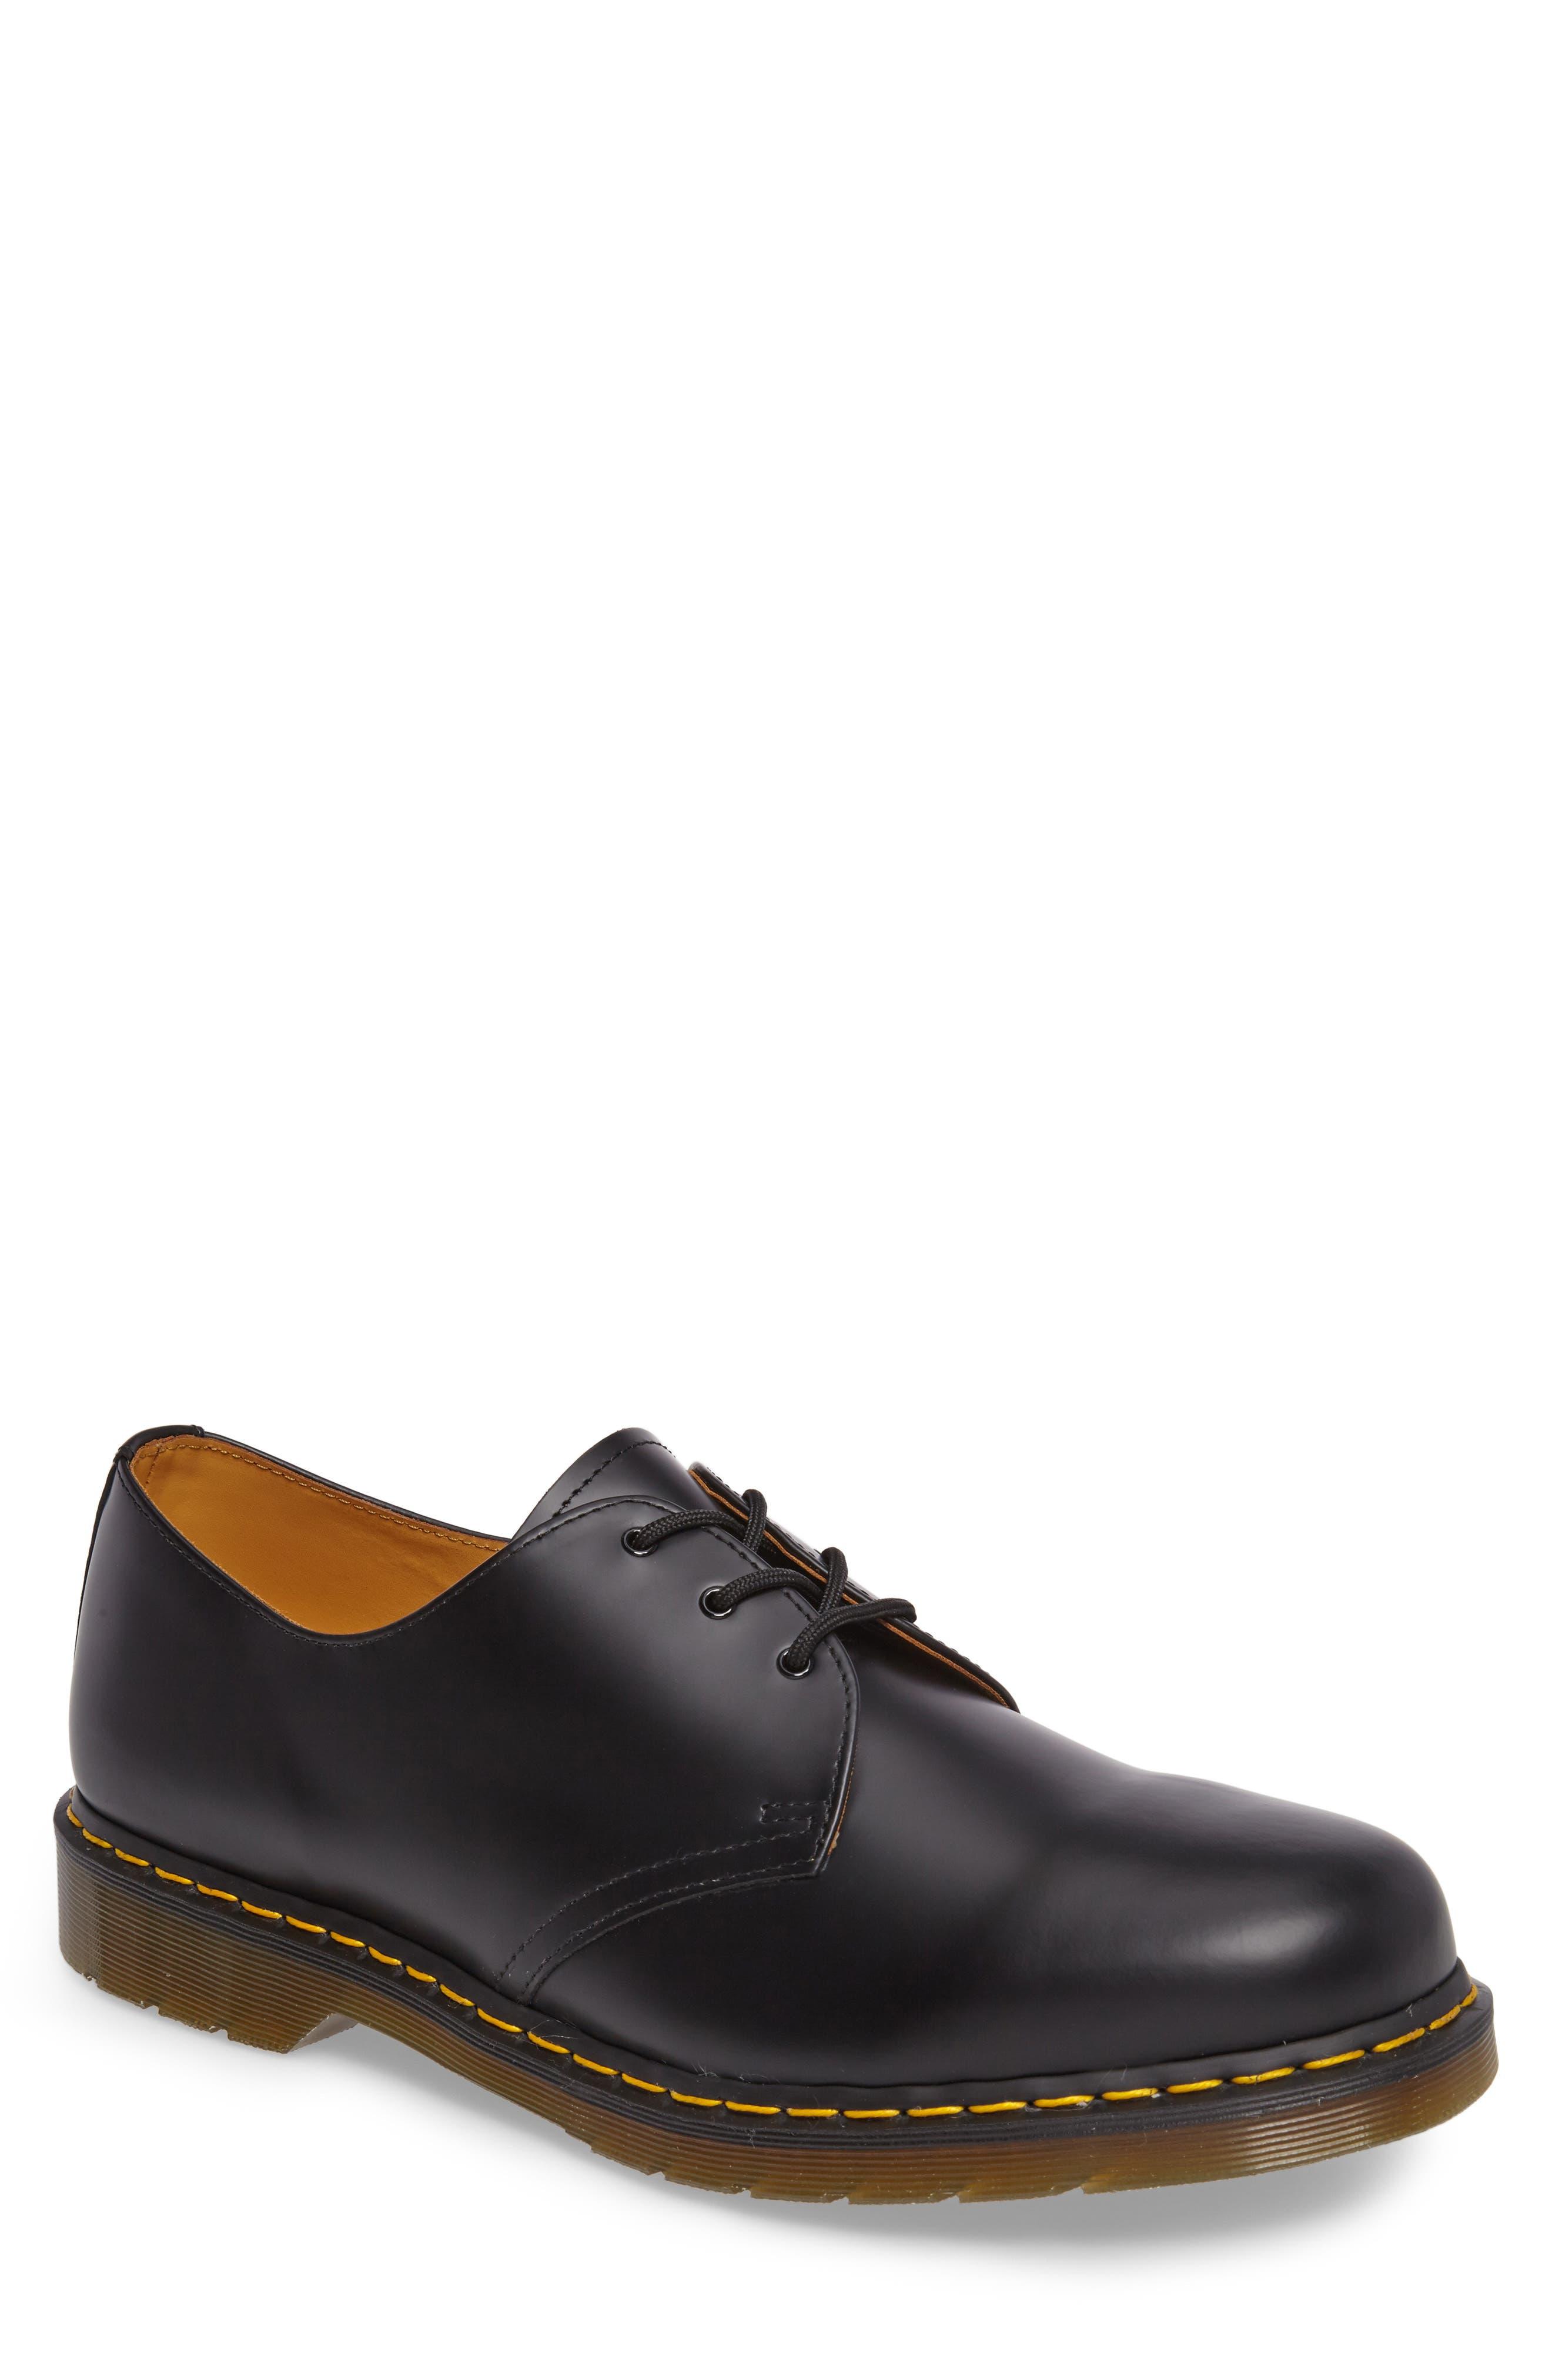 comfort pin kicks shoes pinterest martens dr comforter chelsea boots doctor